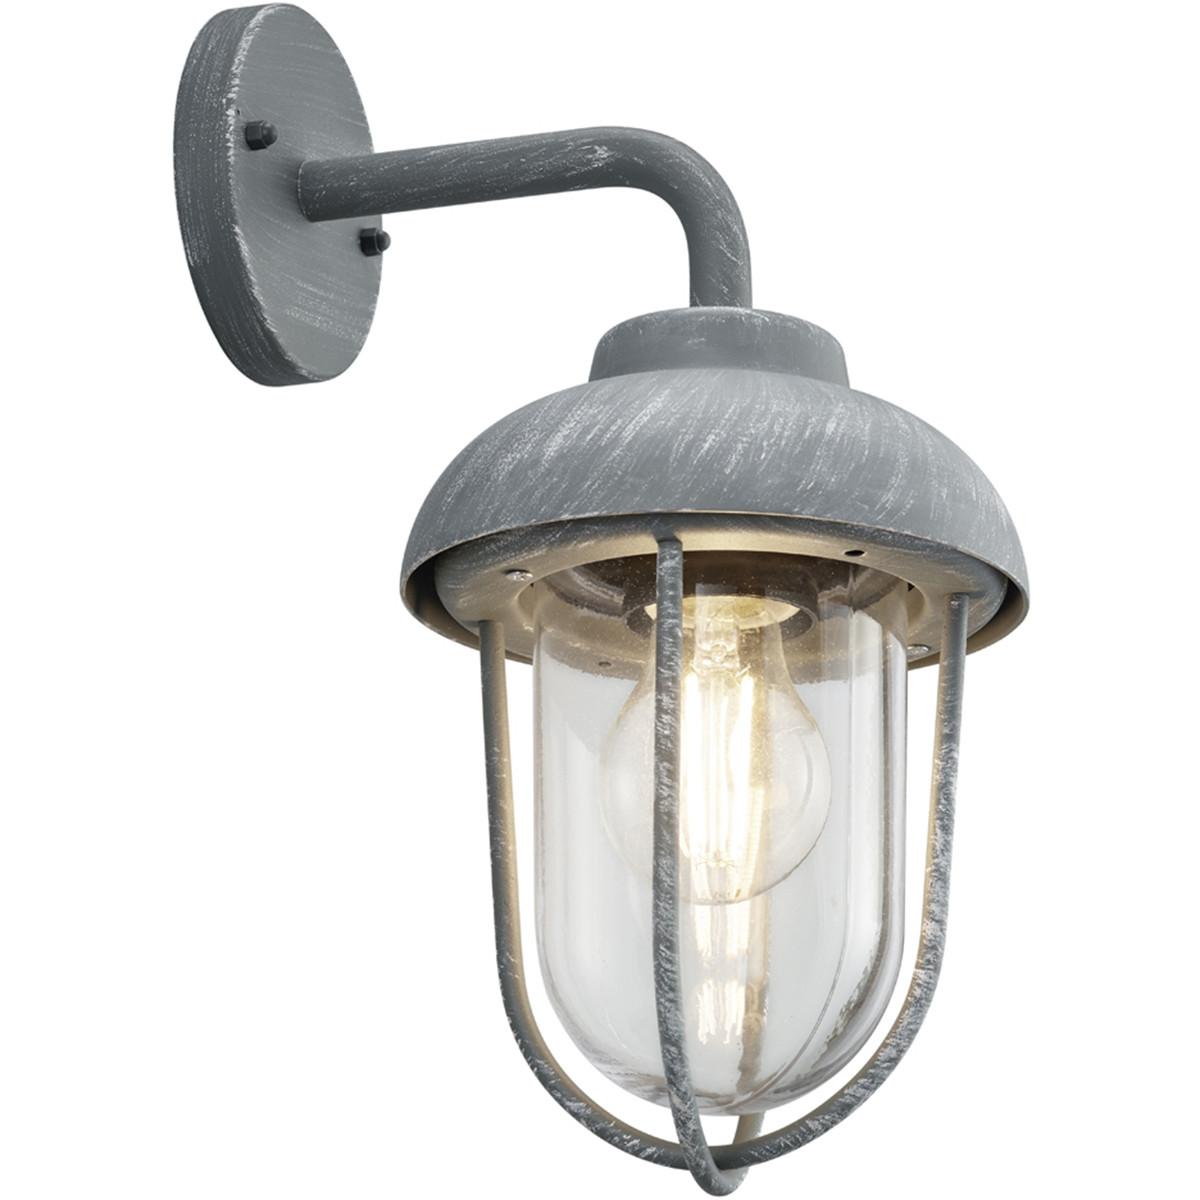 LED Tuinverlichting - Tuinlamp - Trion Dereuri - Wand - E27 Fitting - Beton Look - Aluminium